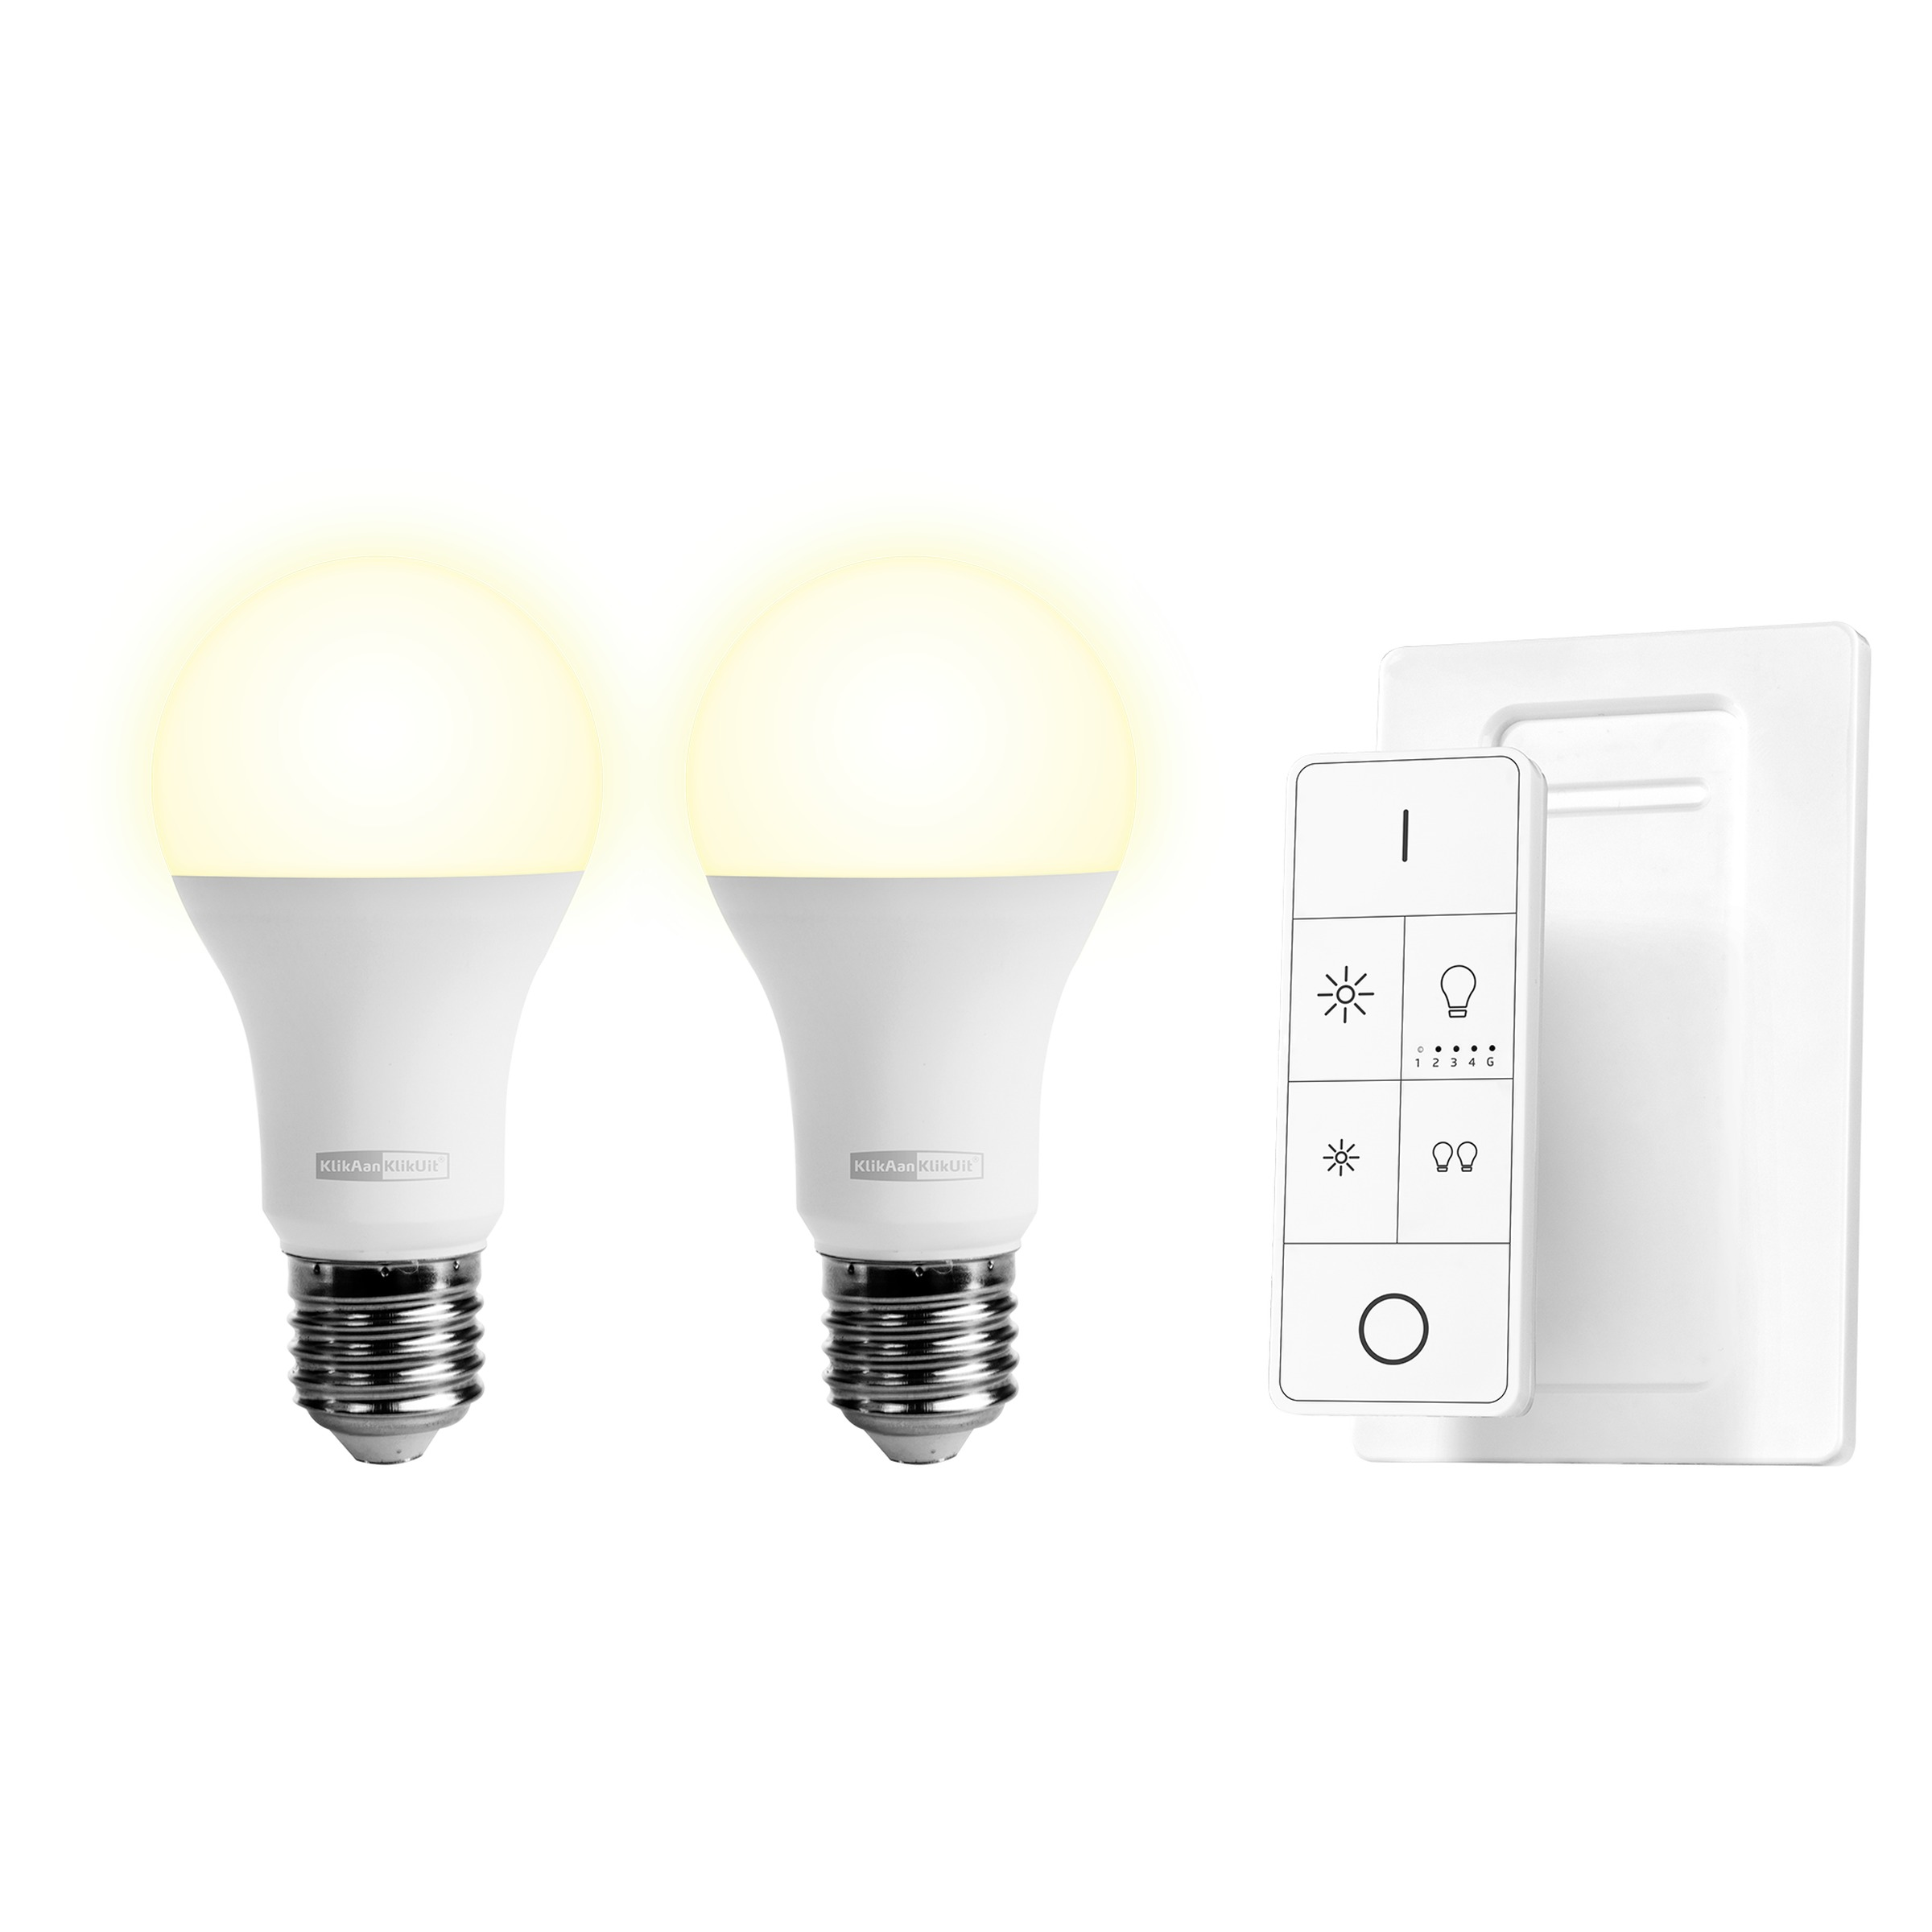 KlikAanKlikUit ALED2-2709R Dimbare Lampen Set